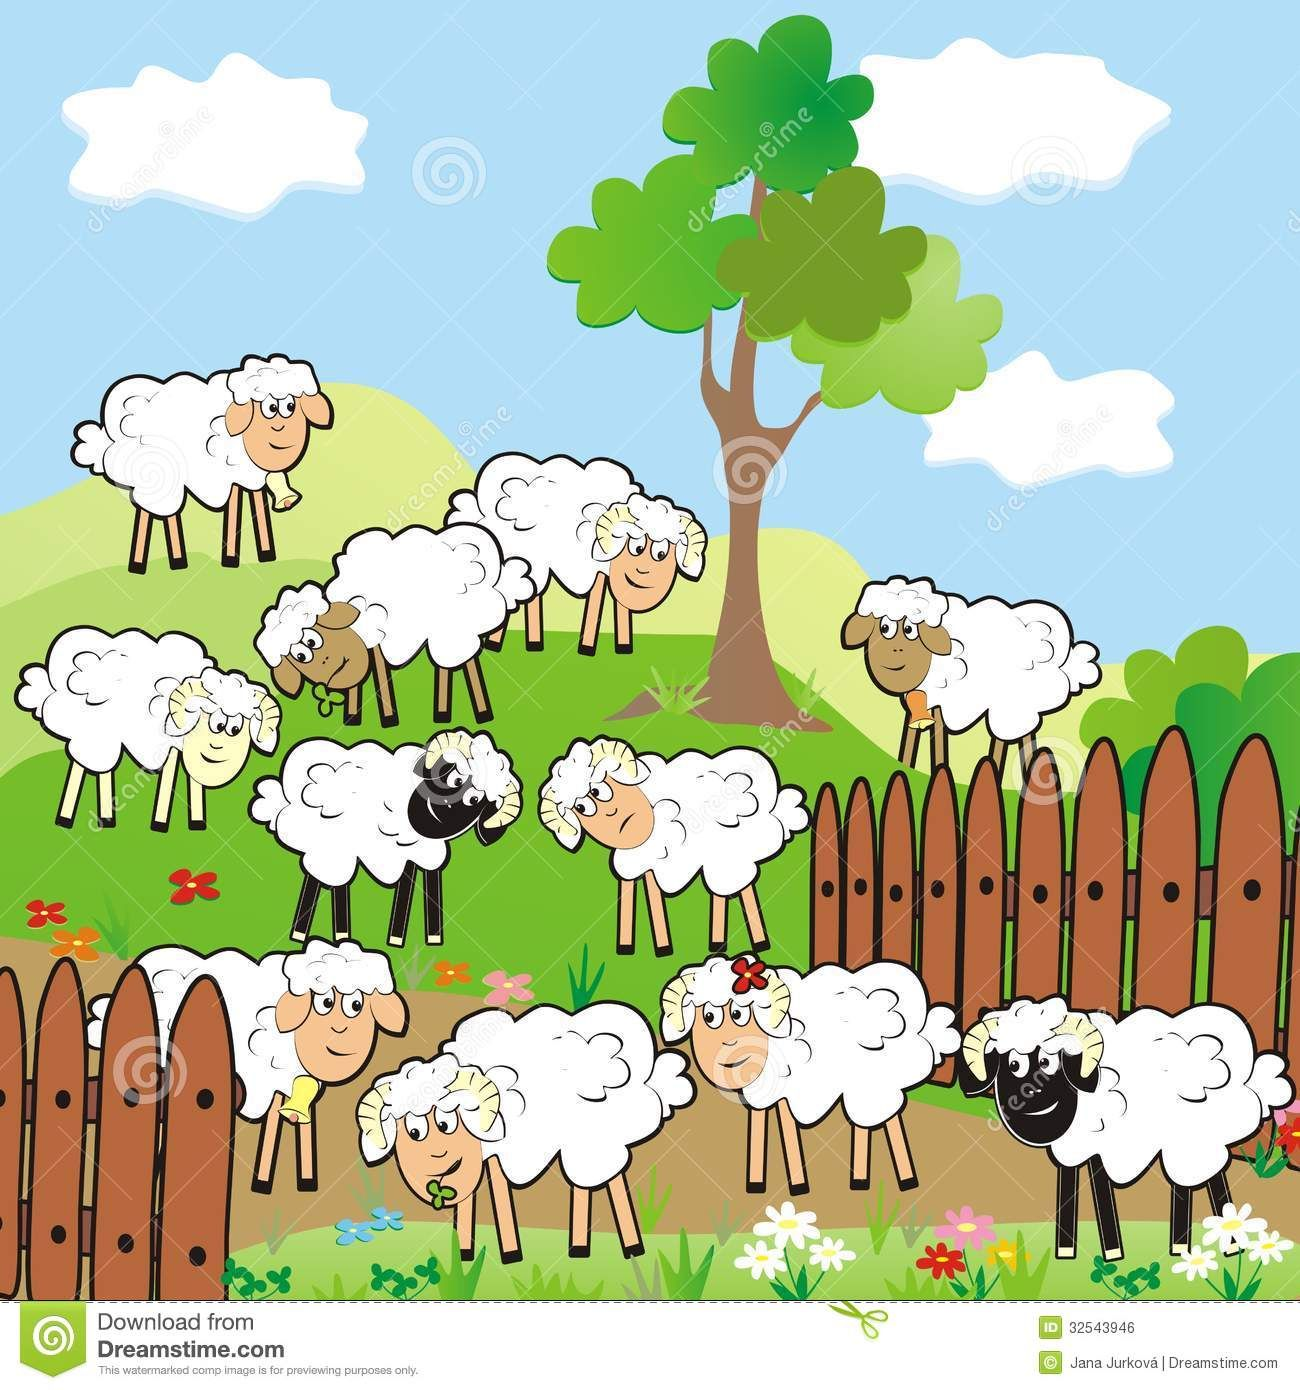 flock of sheep clipart - Google Search | freya | Pinterest